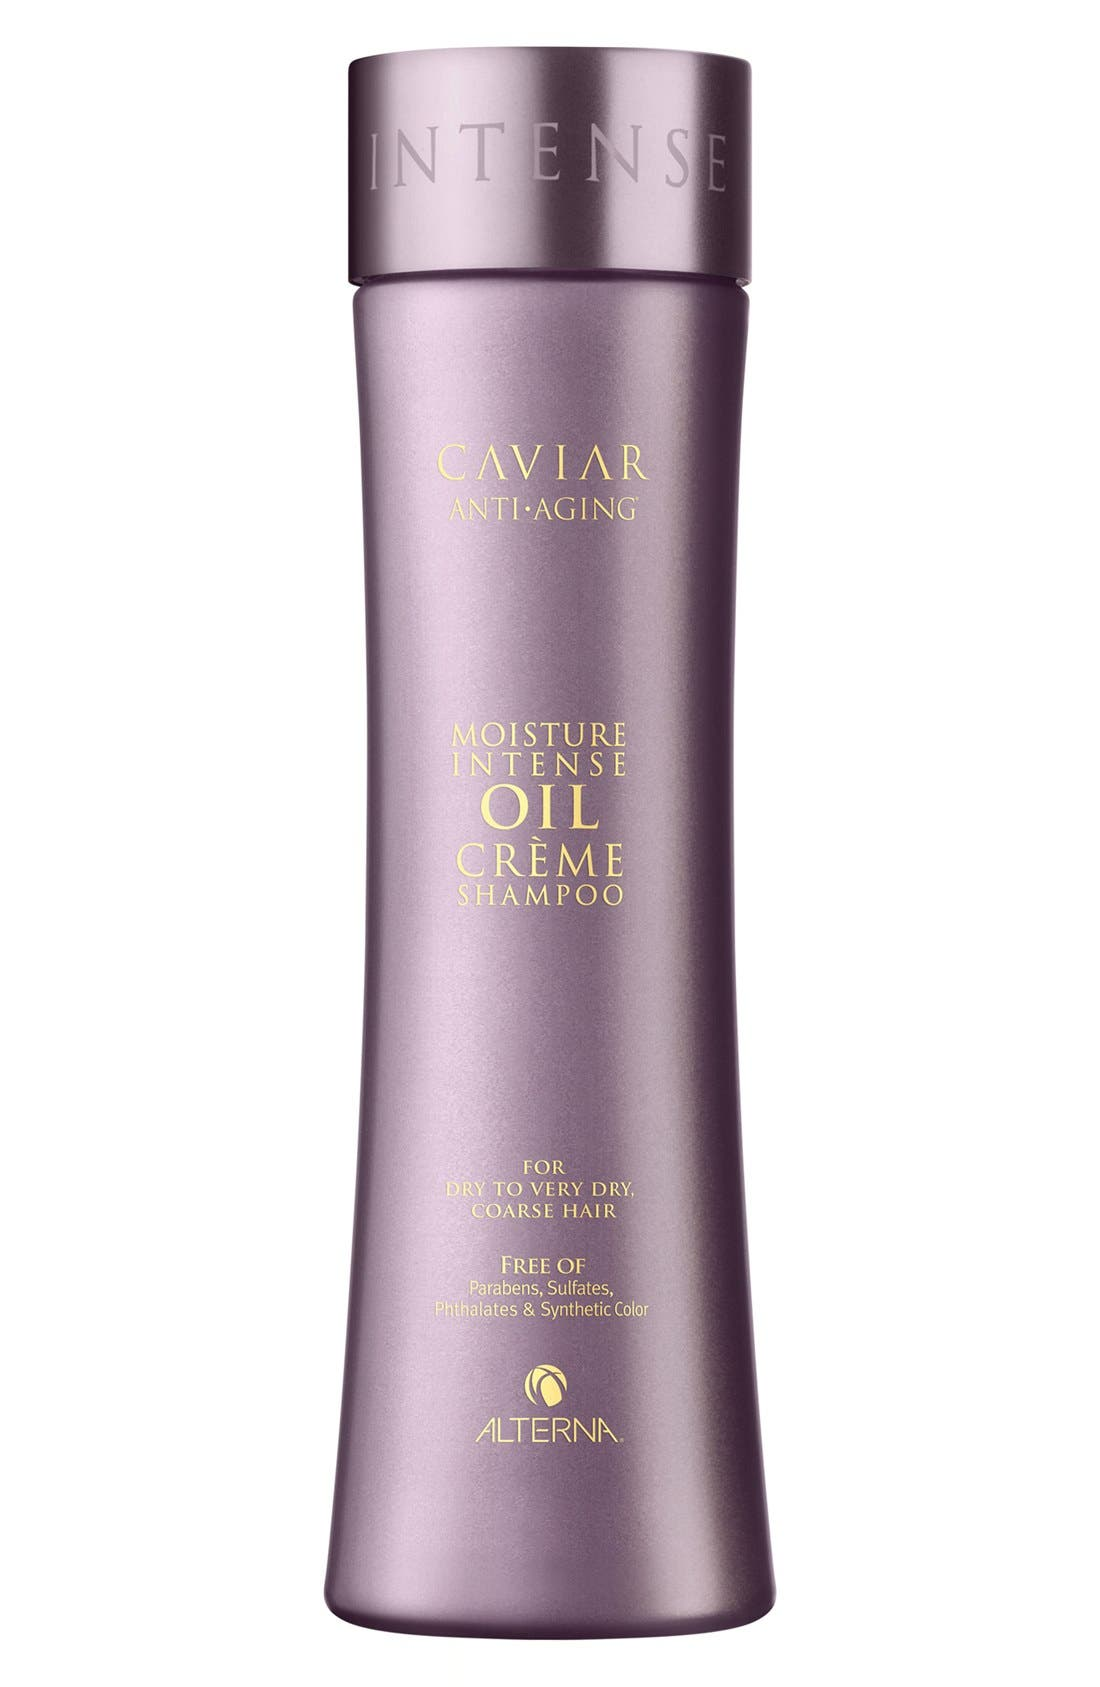 ALTERNA Caviar Anti-Aging Moisture Intense Oil Creme Shampoo,                             Main thumbnail 1, color,